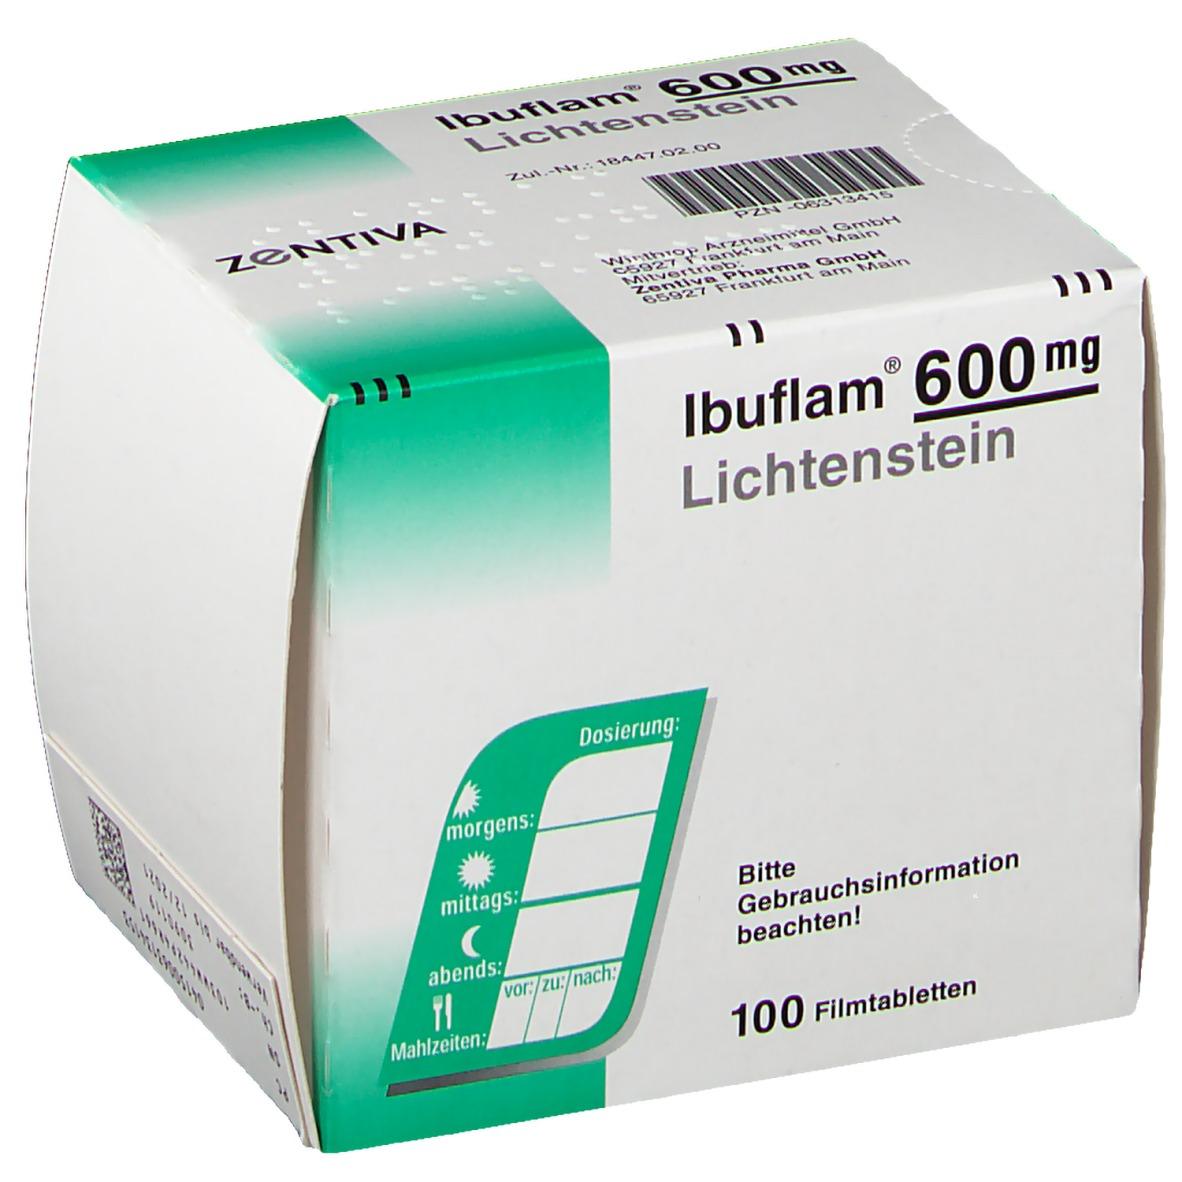 Ibuflam 600 mg wirkung